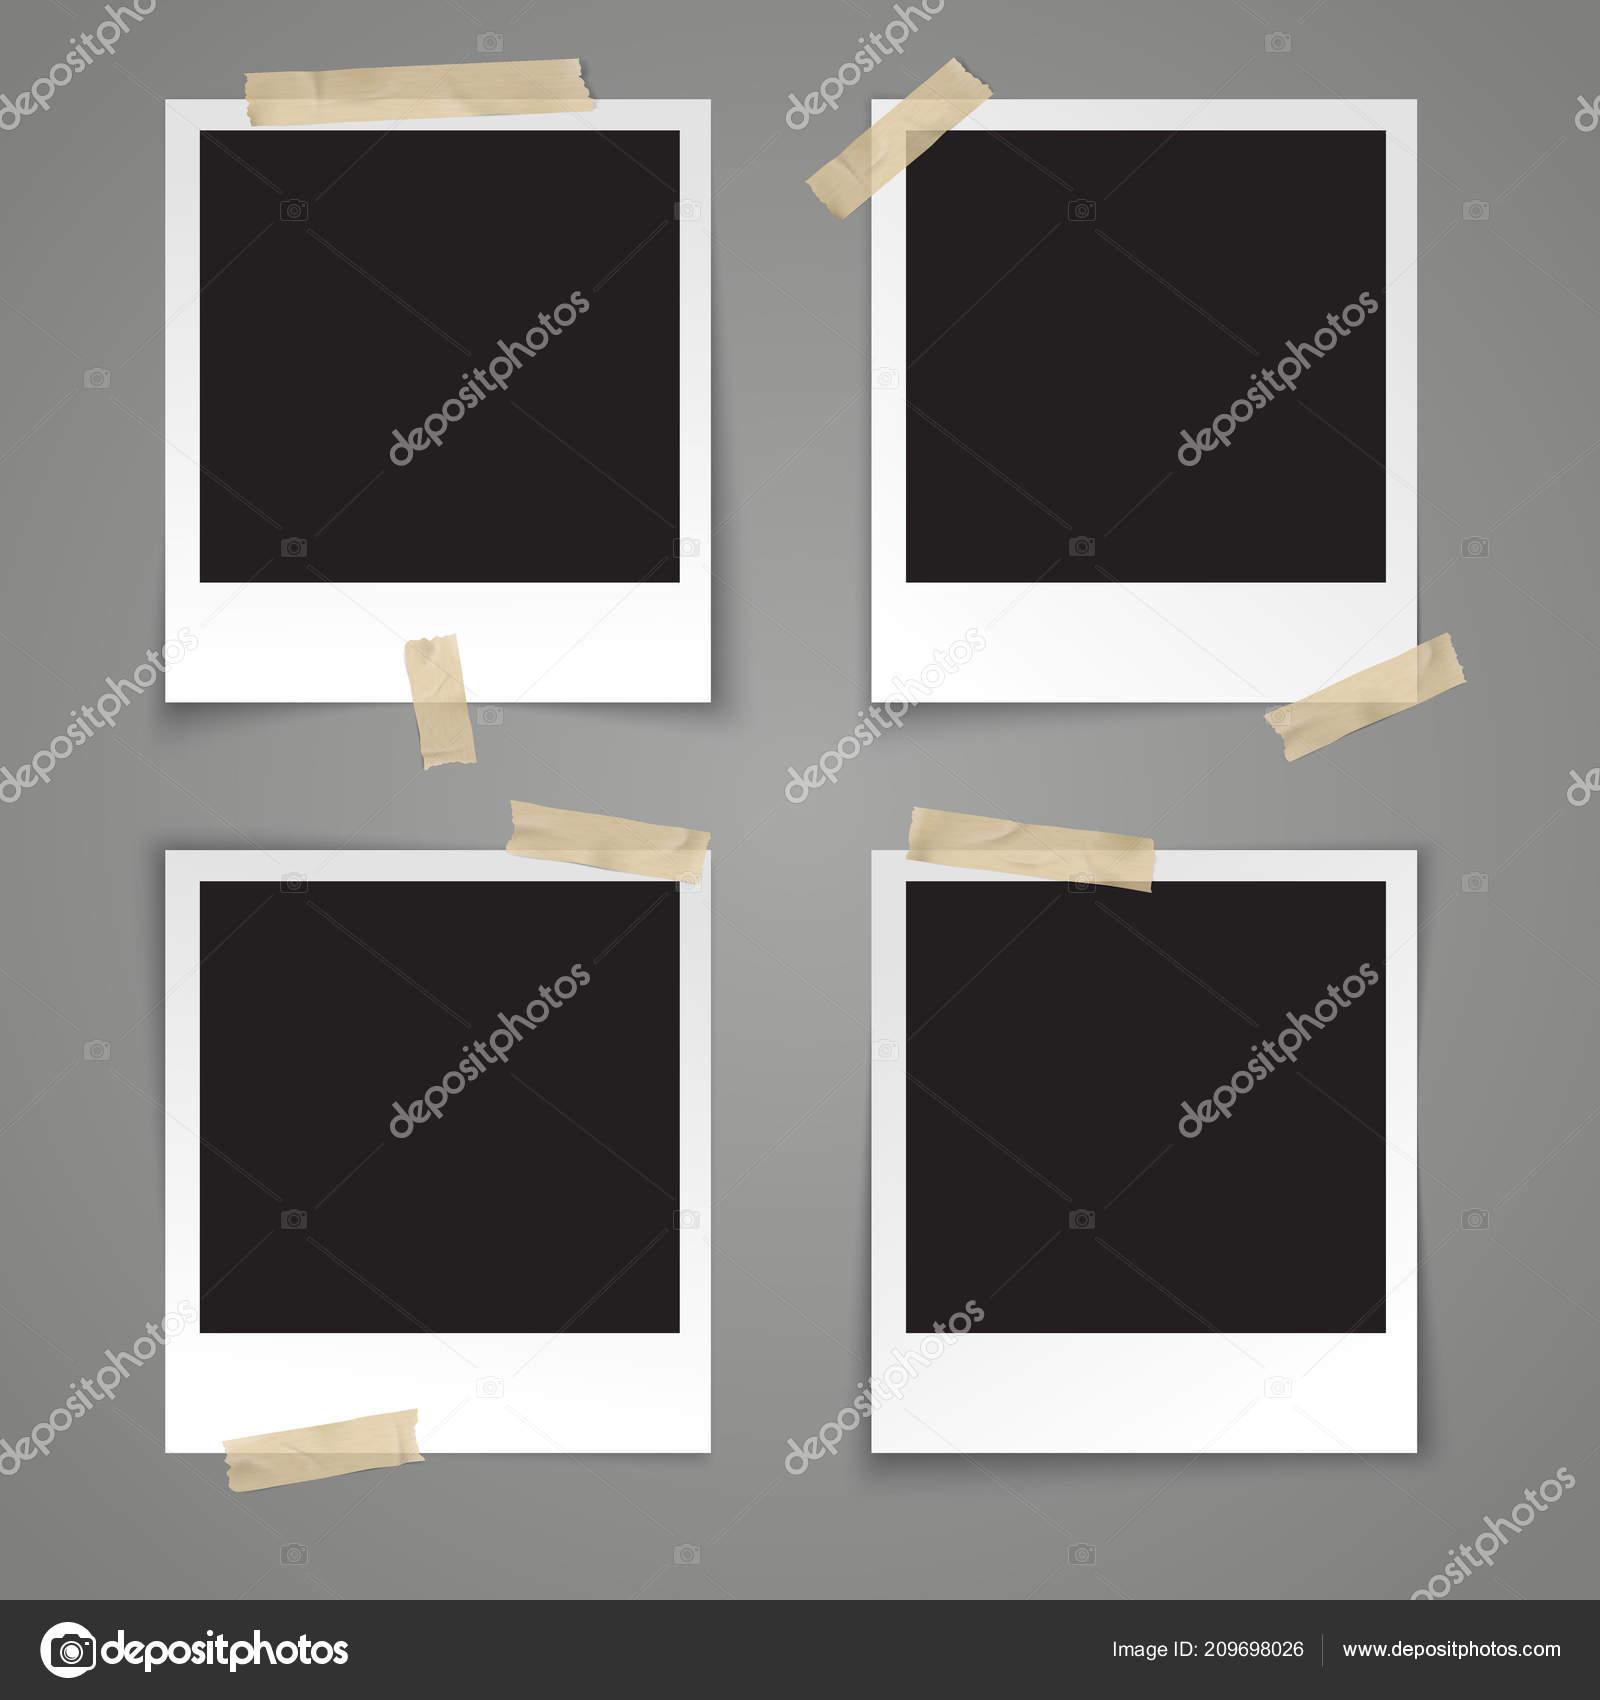 Realistic Vector Illustration Photo Frame Template Transparent